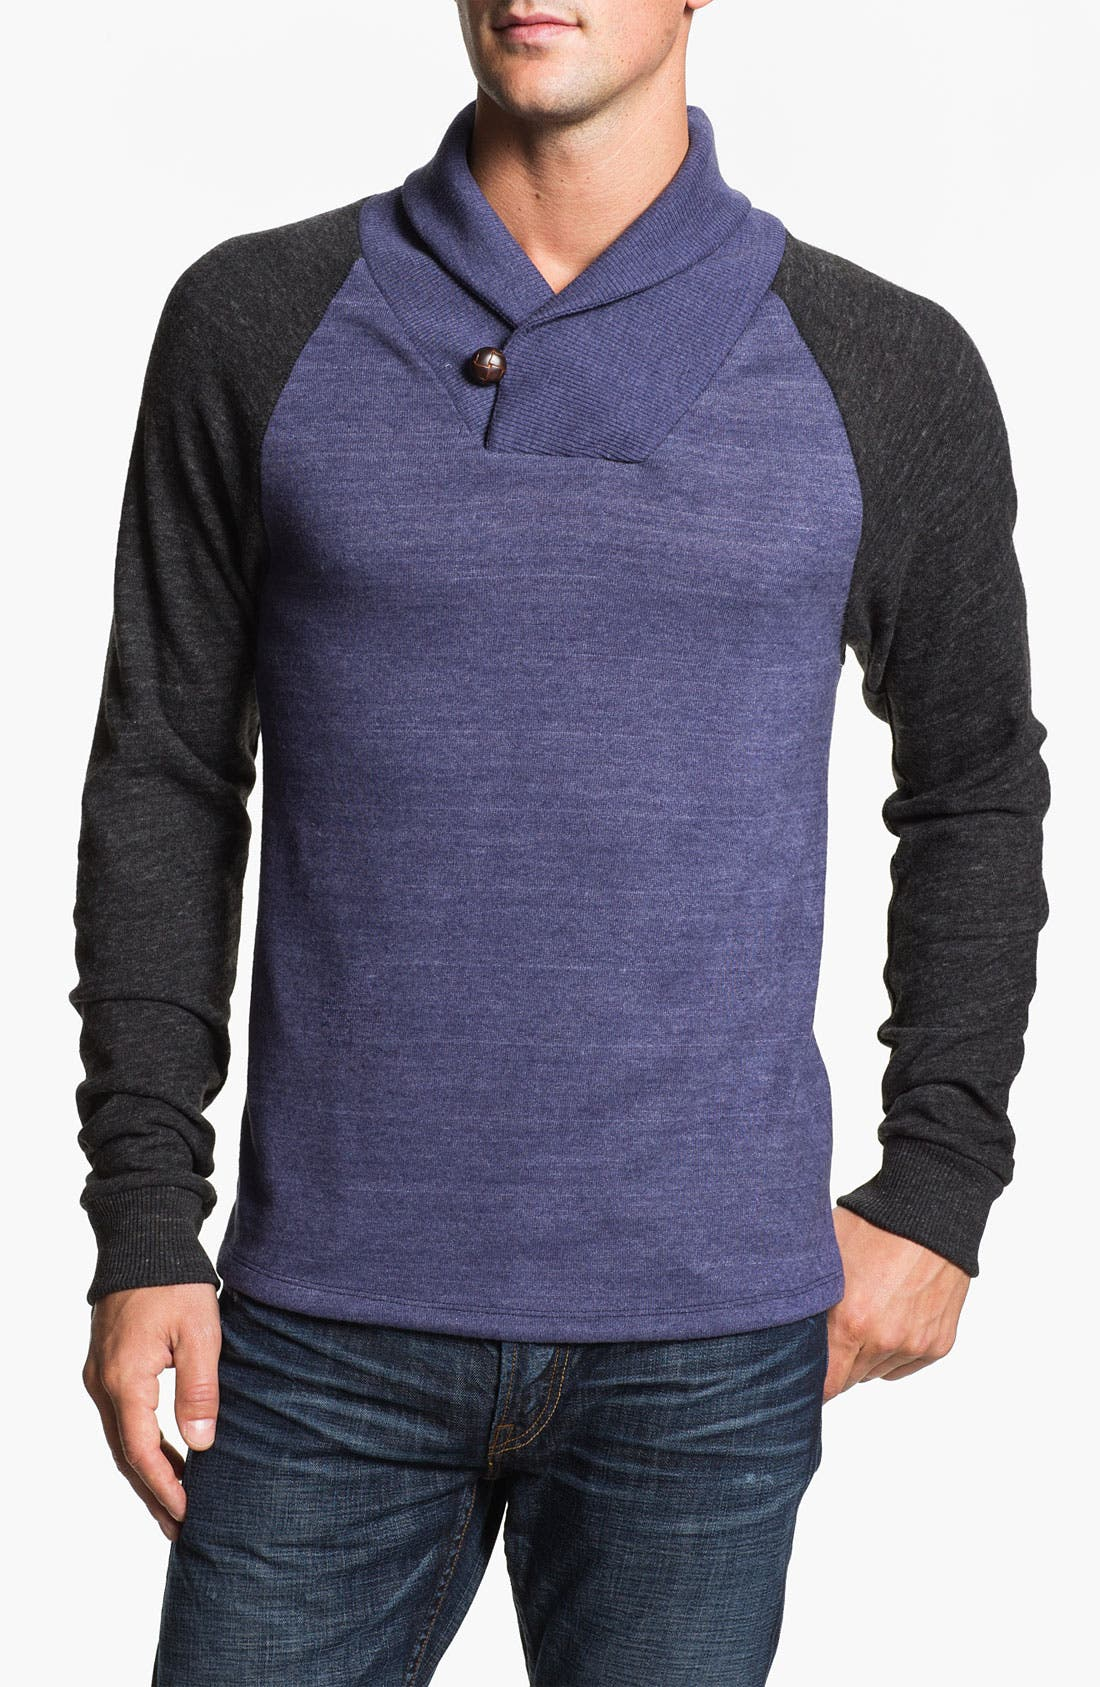 Alternate Image 1 Selected - Alternative 'Oliver' Shawl Collar Sweatshirt